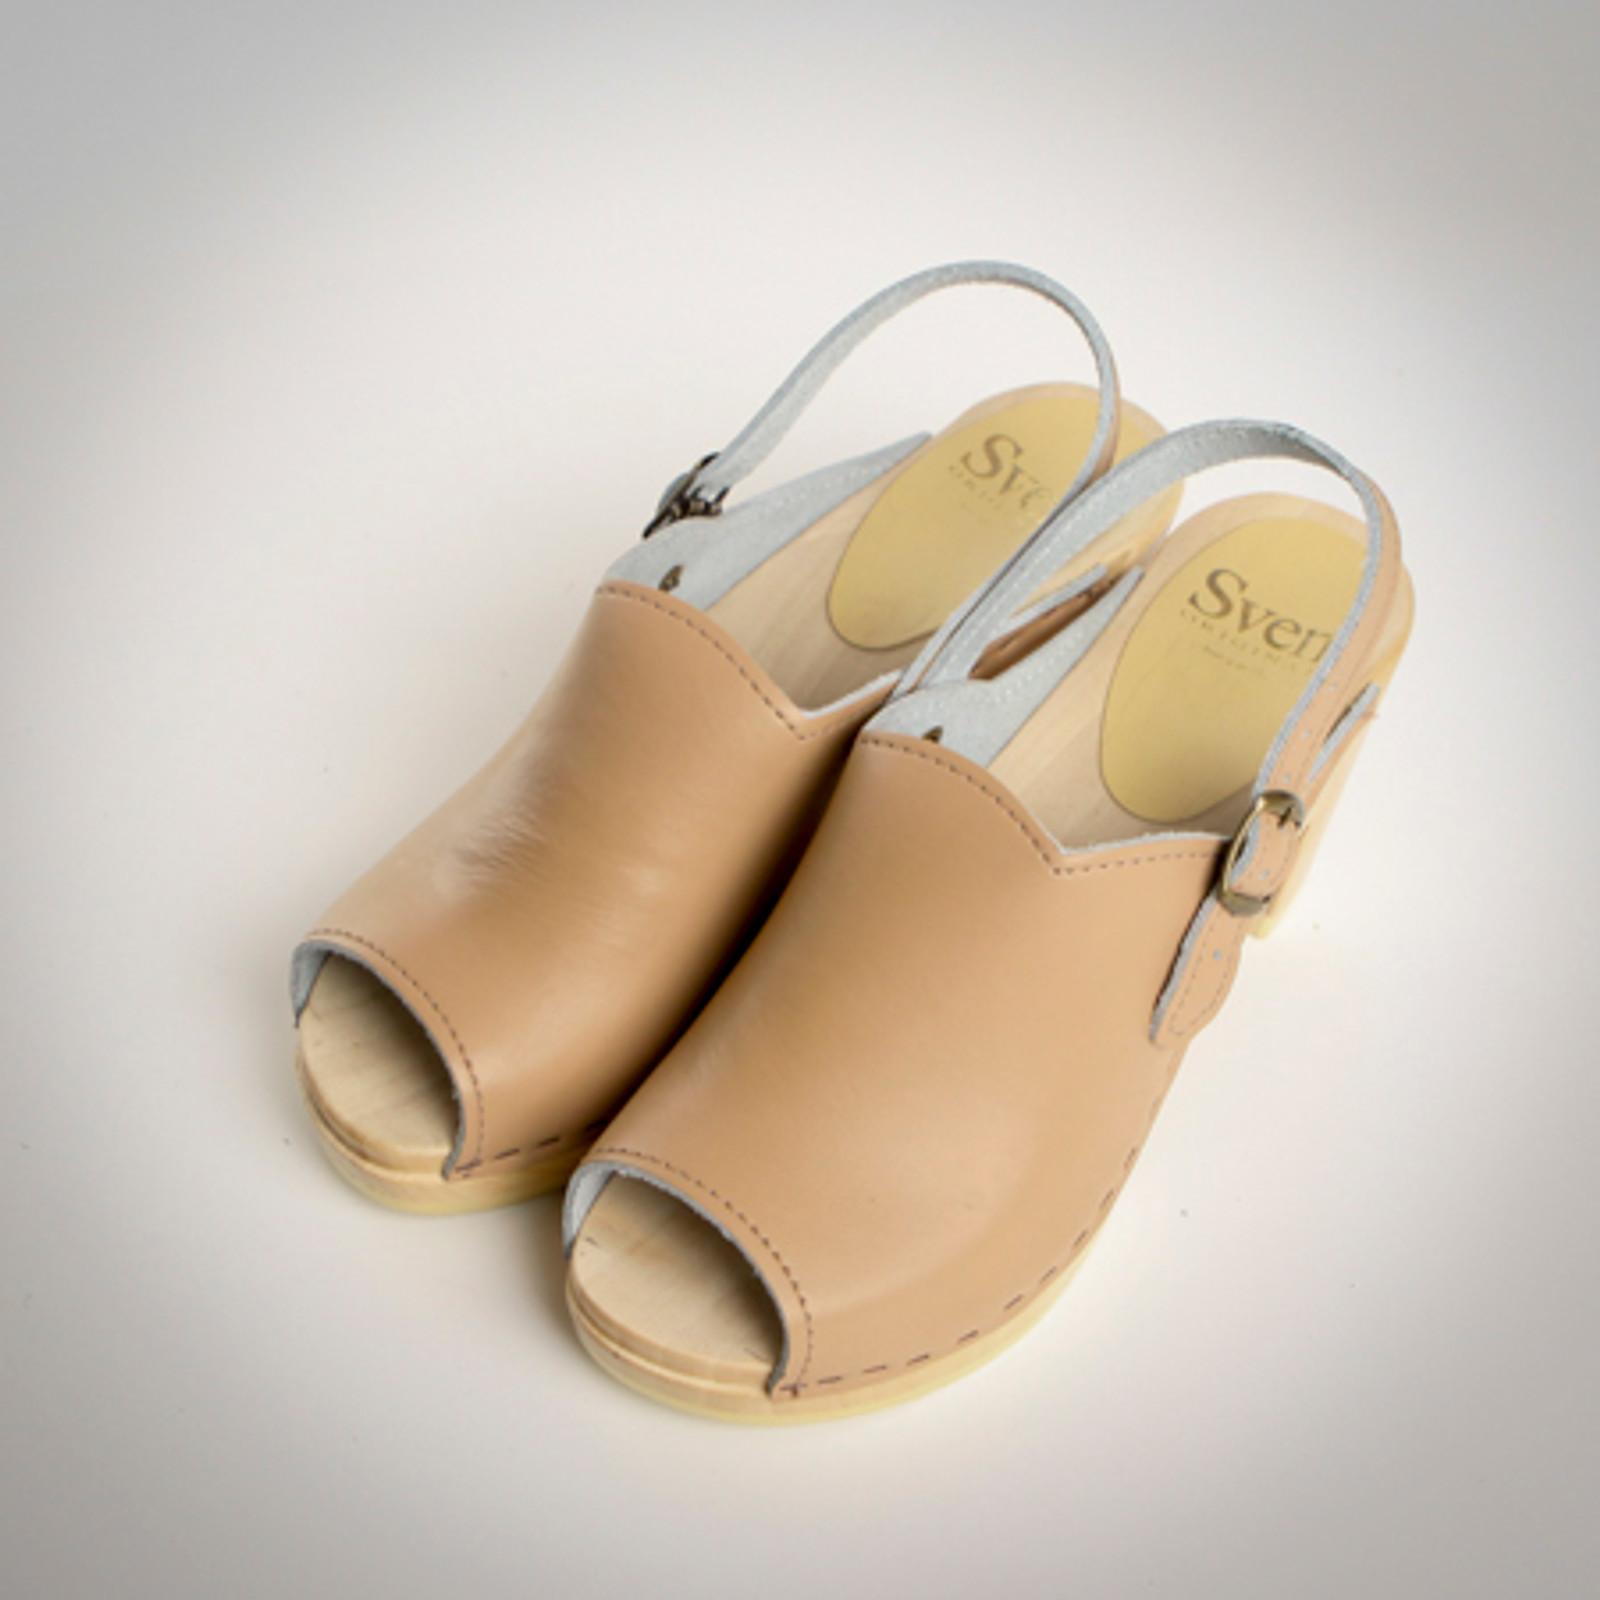 Open Toe Clogs - Sling Straps